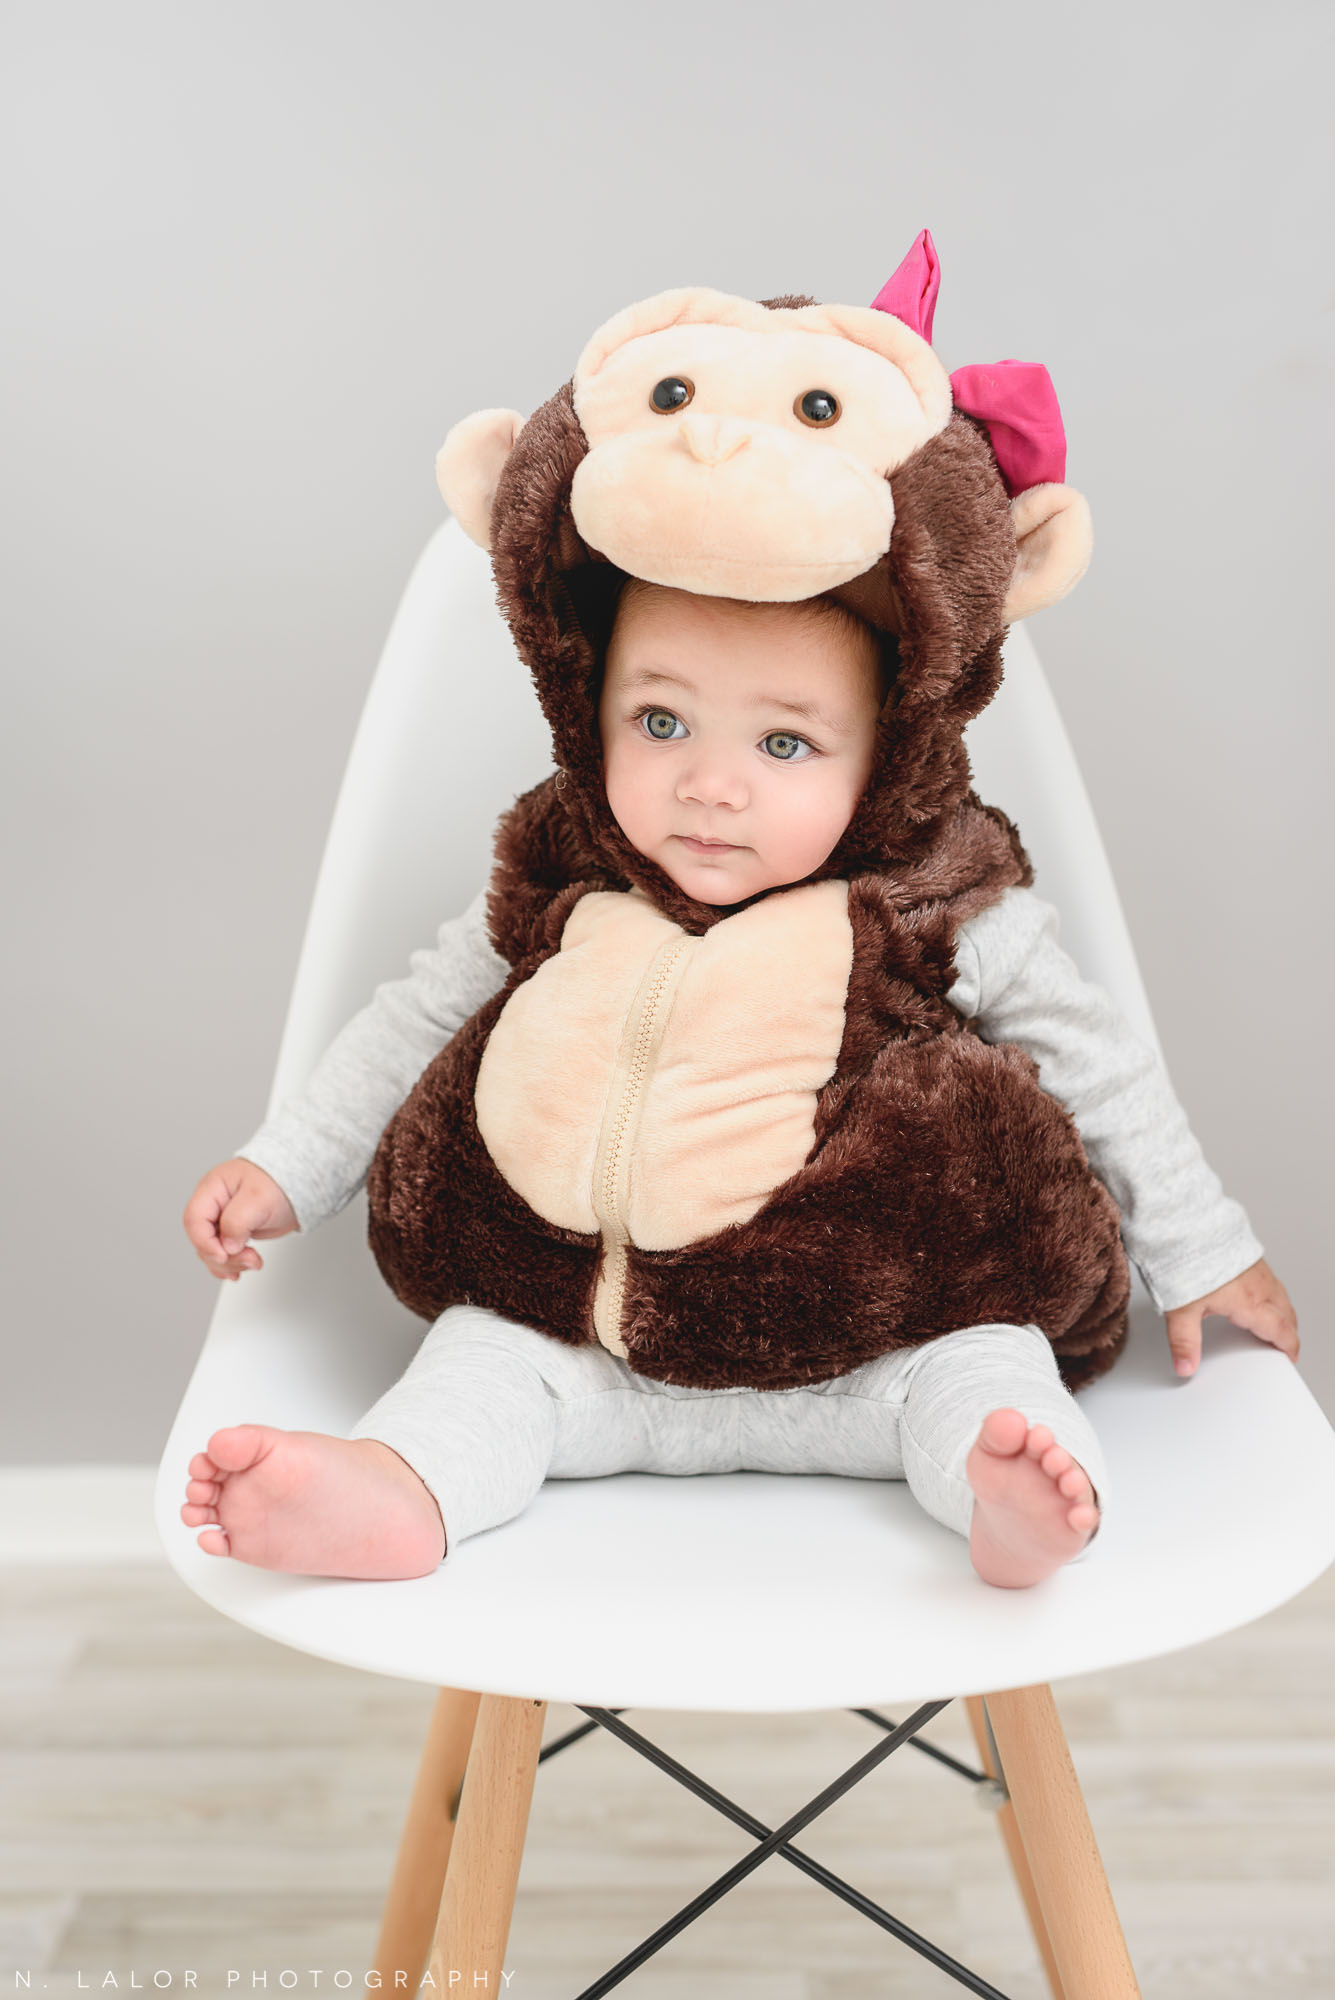 Little monkey. Halloween Kids Portrait by N. Lalor Photography. Greenwich, Connecticut.